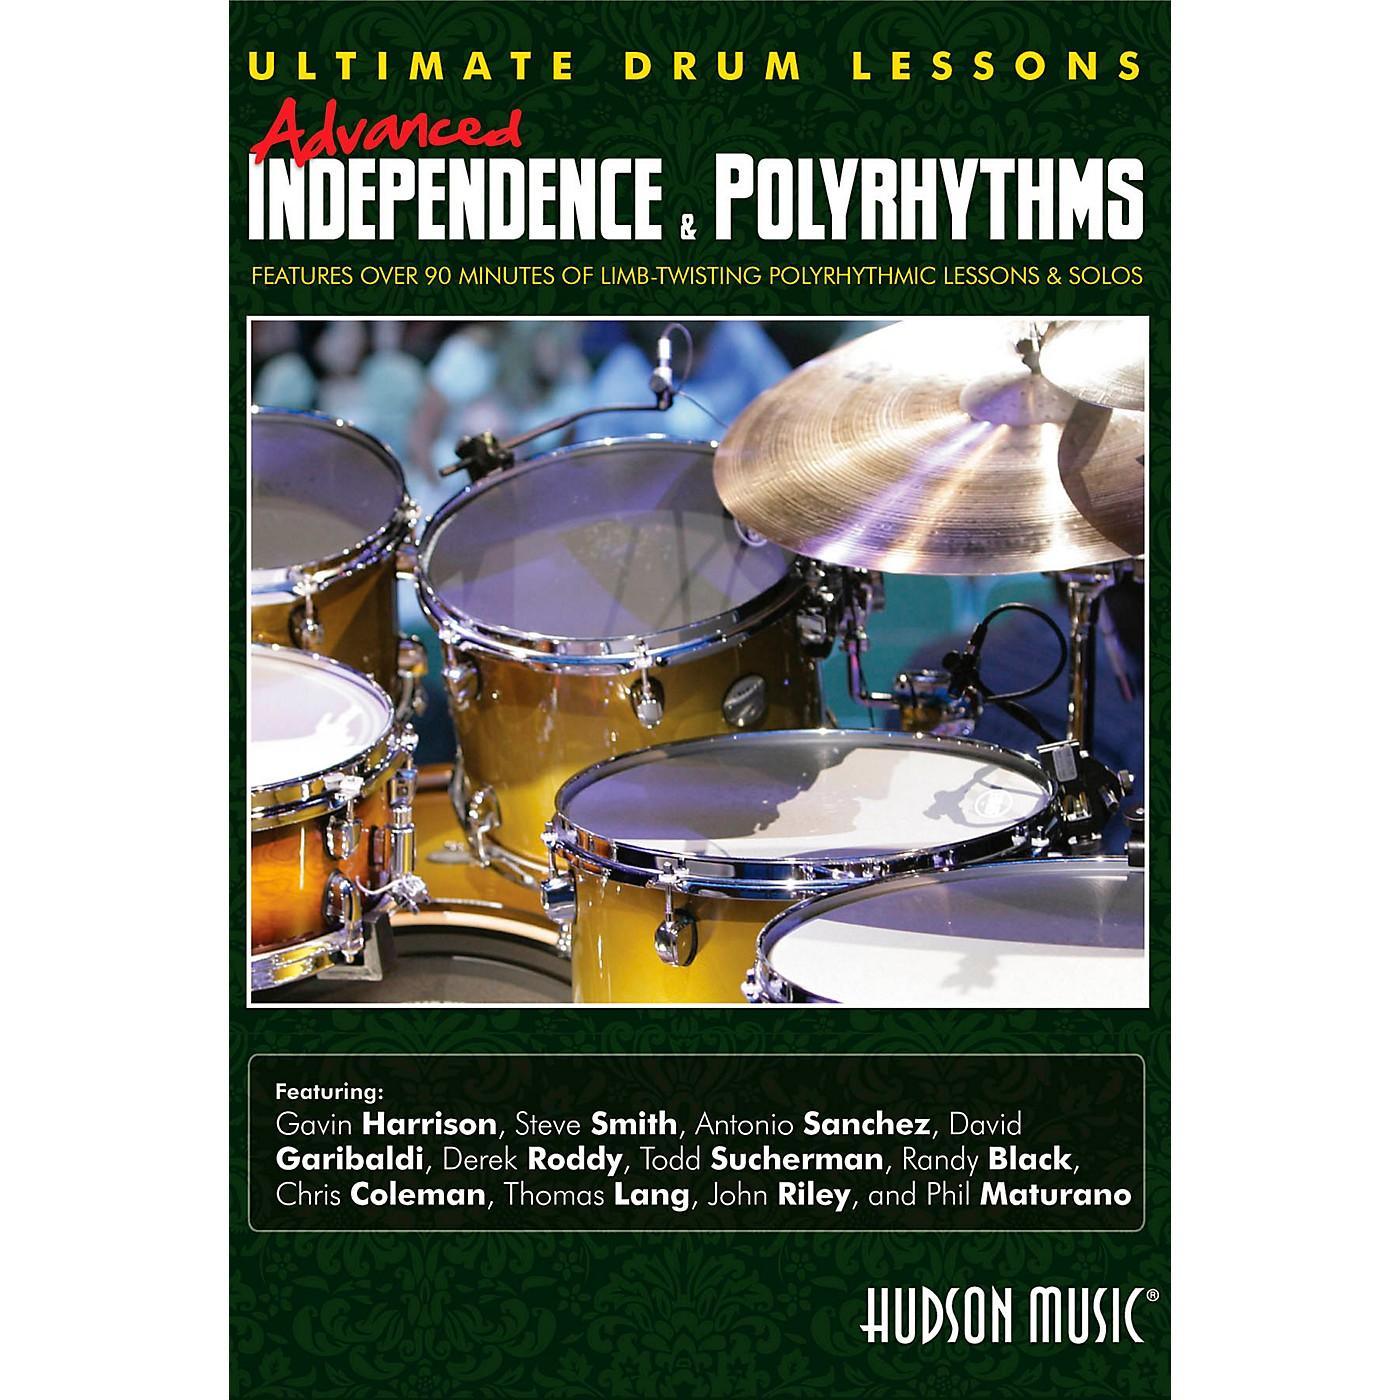 Hudson Music Advanced Independence & Polyrhythms Ultimate Drum Lessons DVD thumbnail